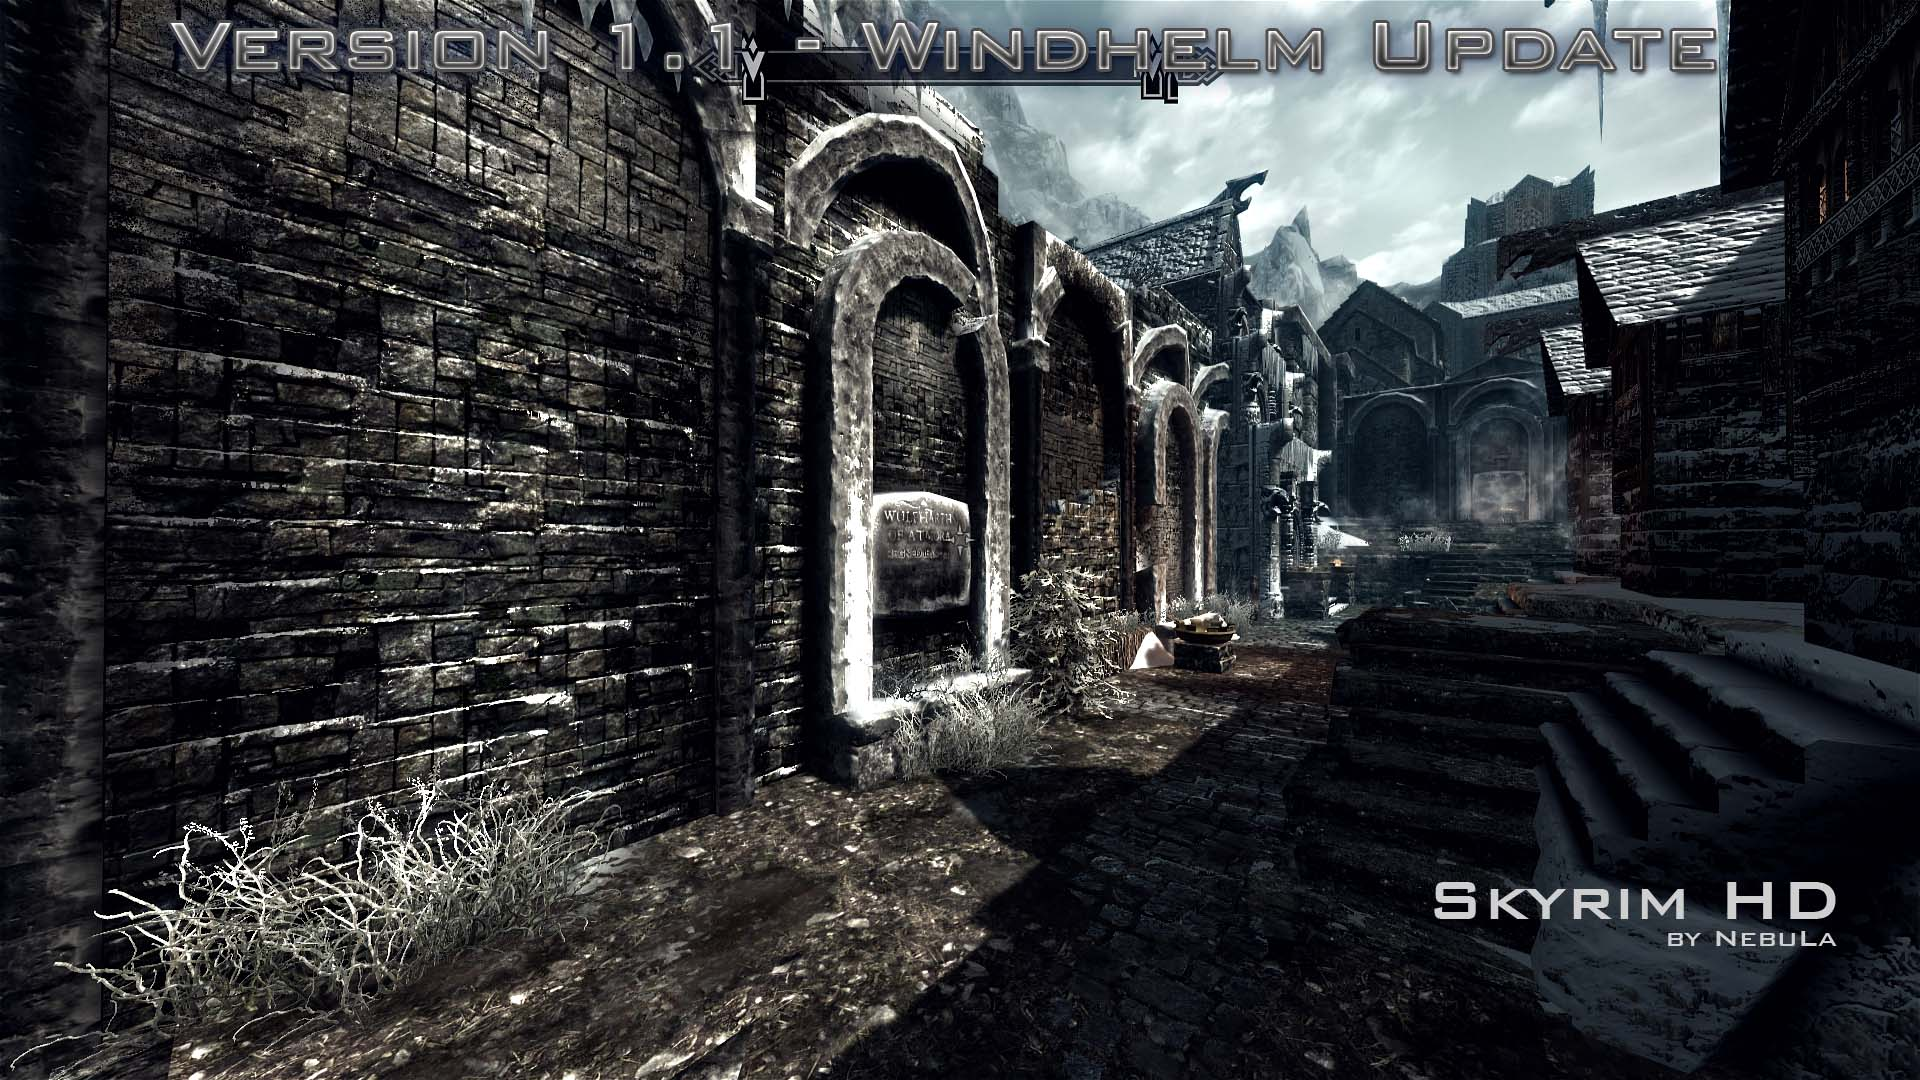 PC Skyrim fans, meet Skyrim HD - 2K Textures